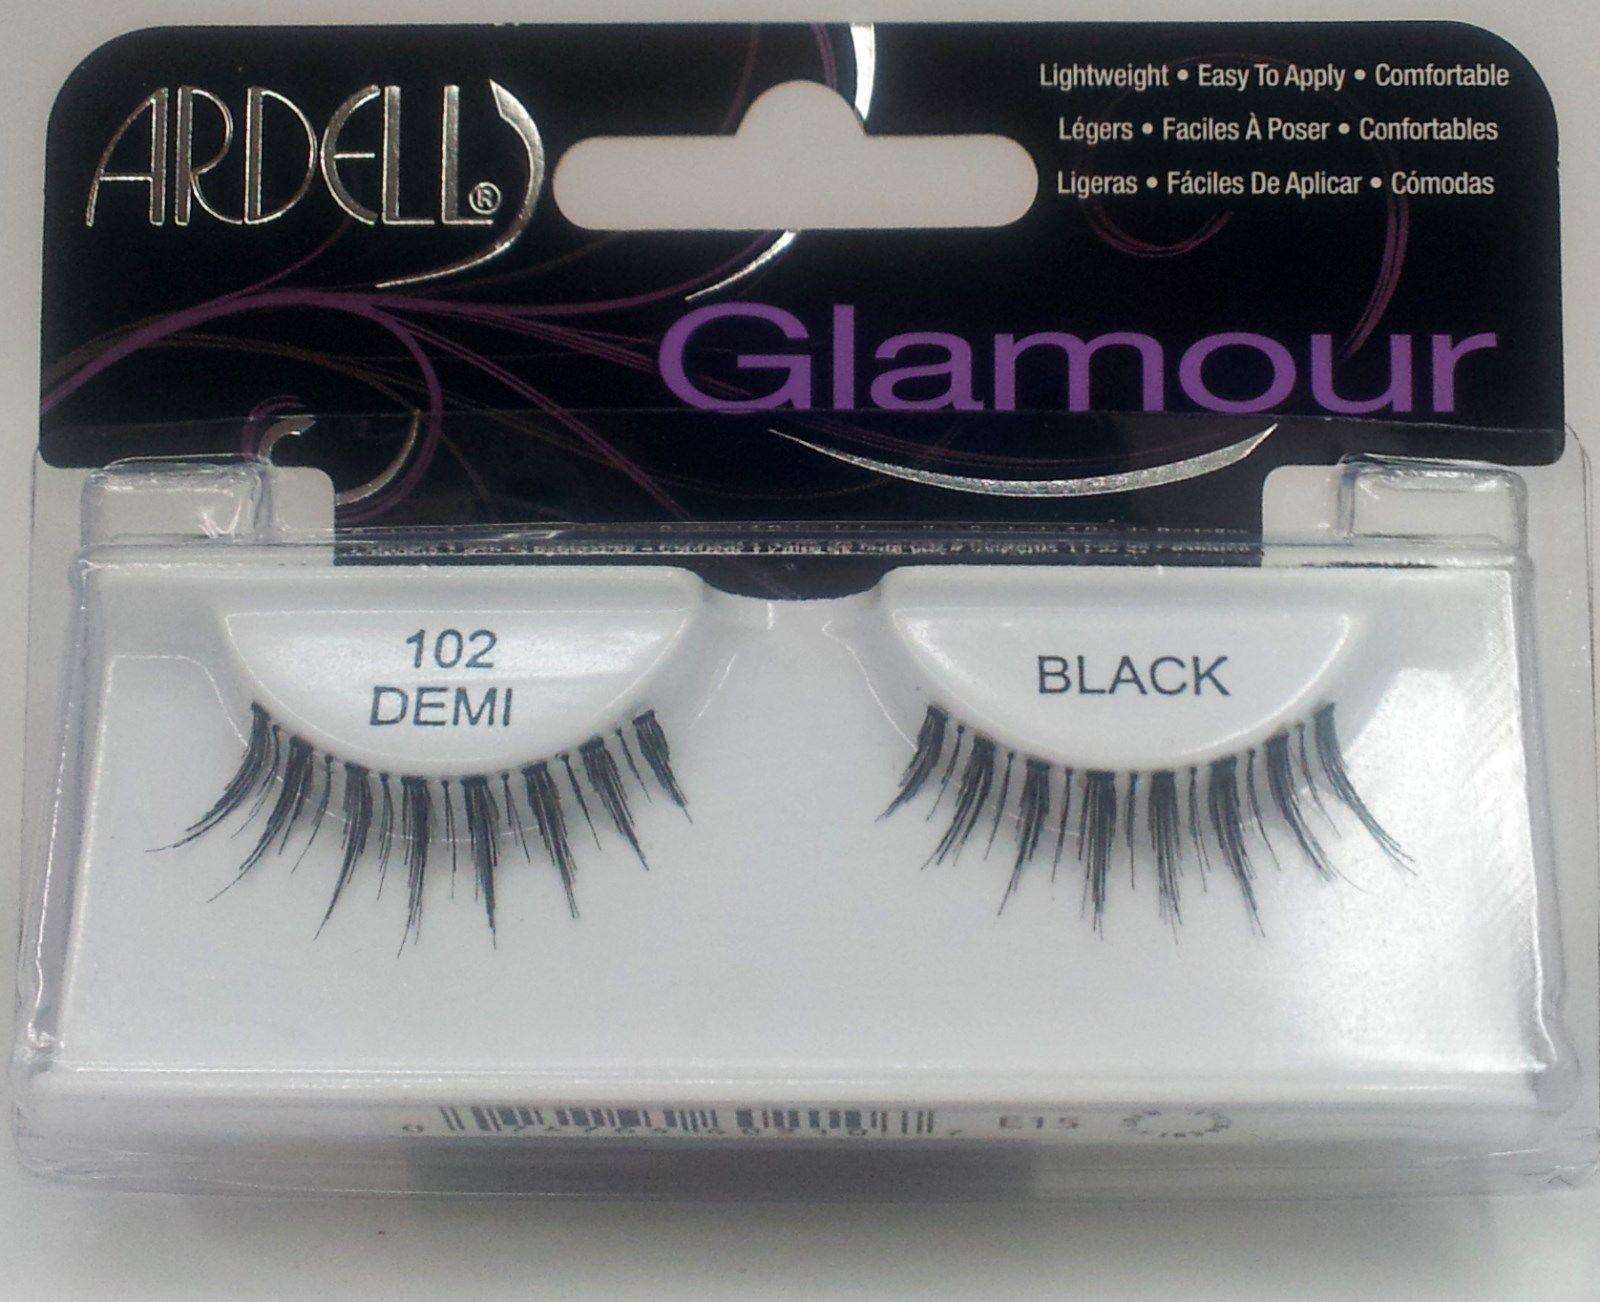 00c51aee113 Ardell Fashion Lashes Eye Lashes 102 - Black (1 Pack) | Products ...